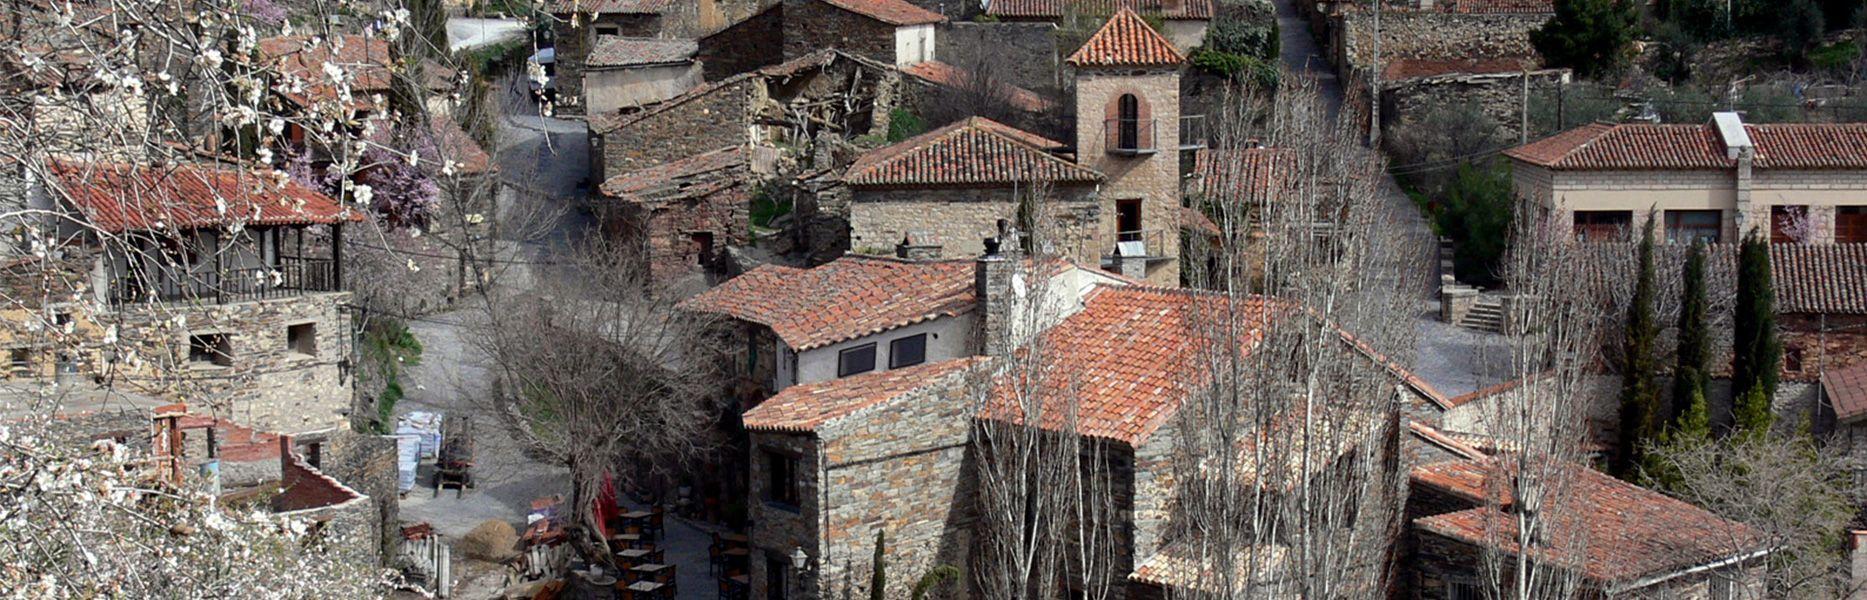 charming-villages-spain